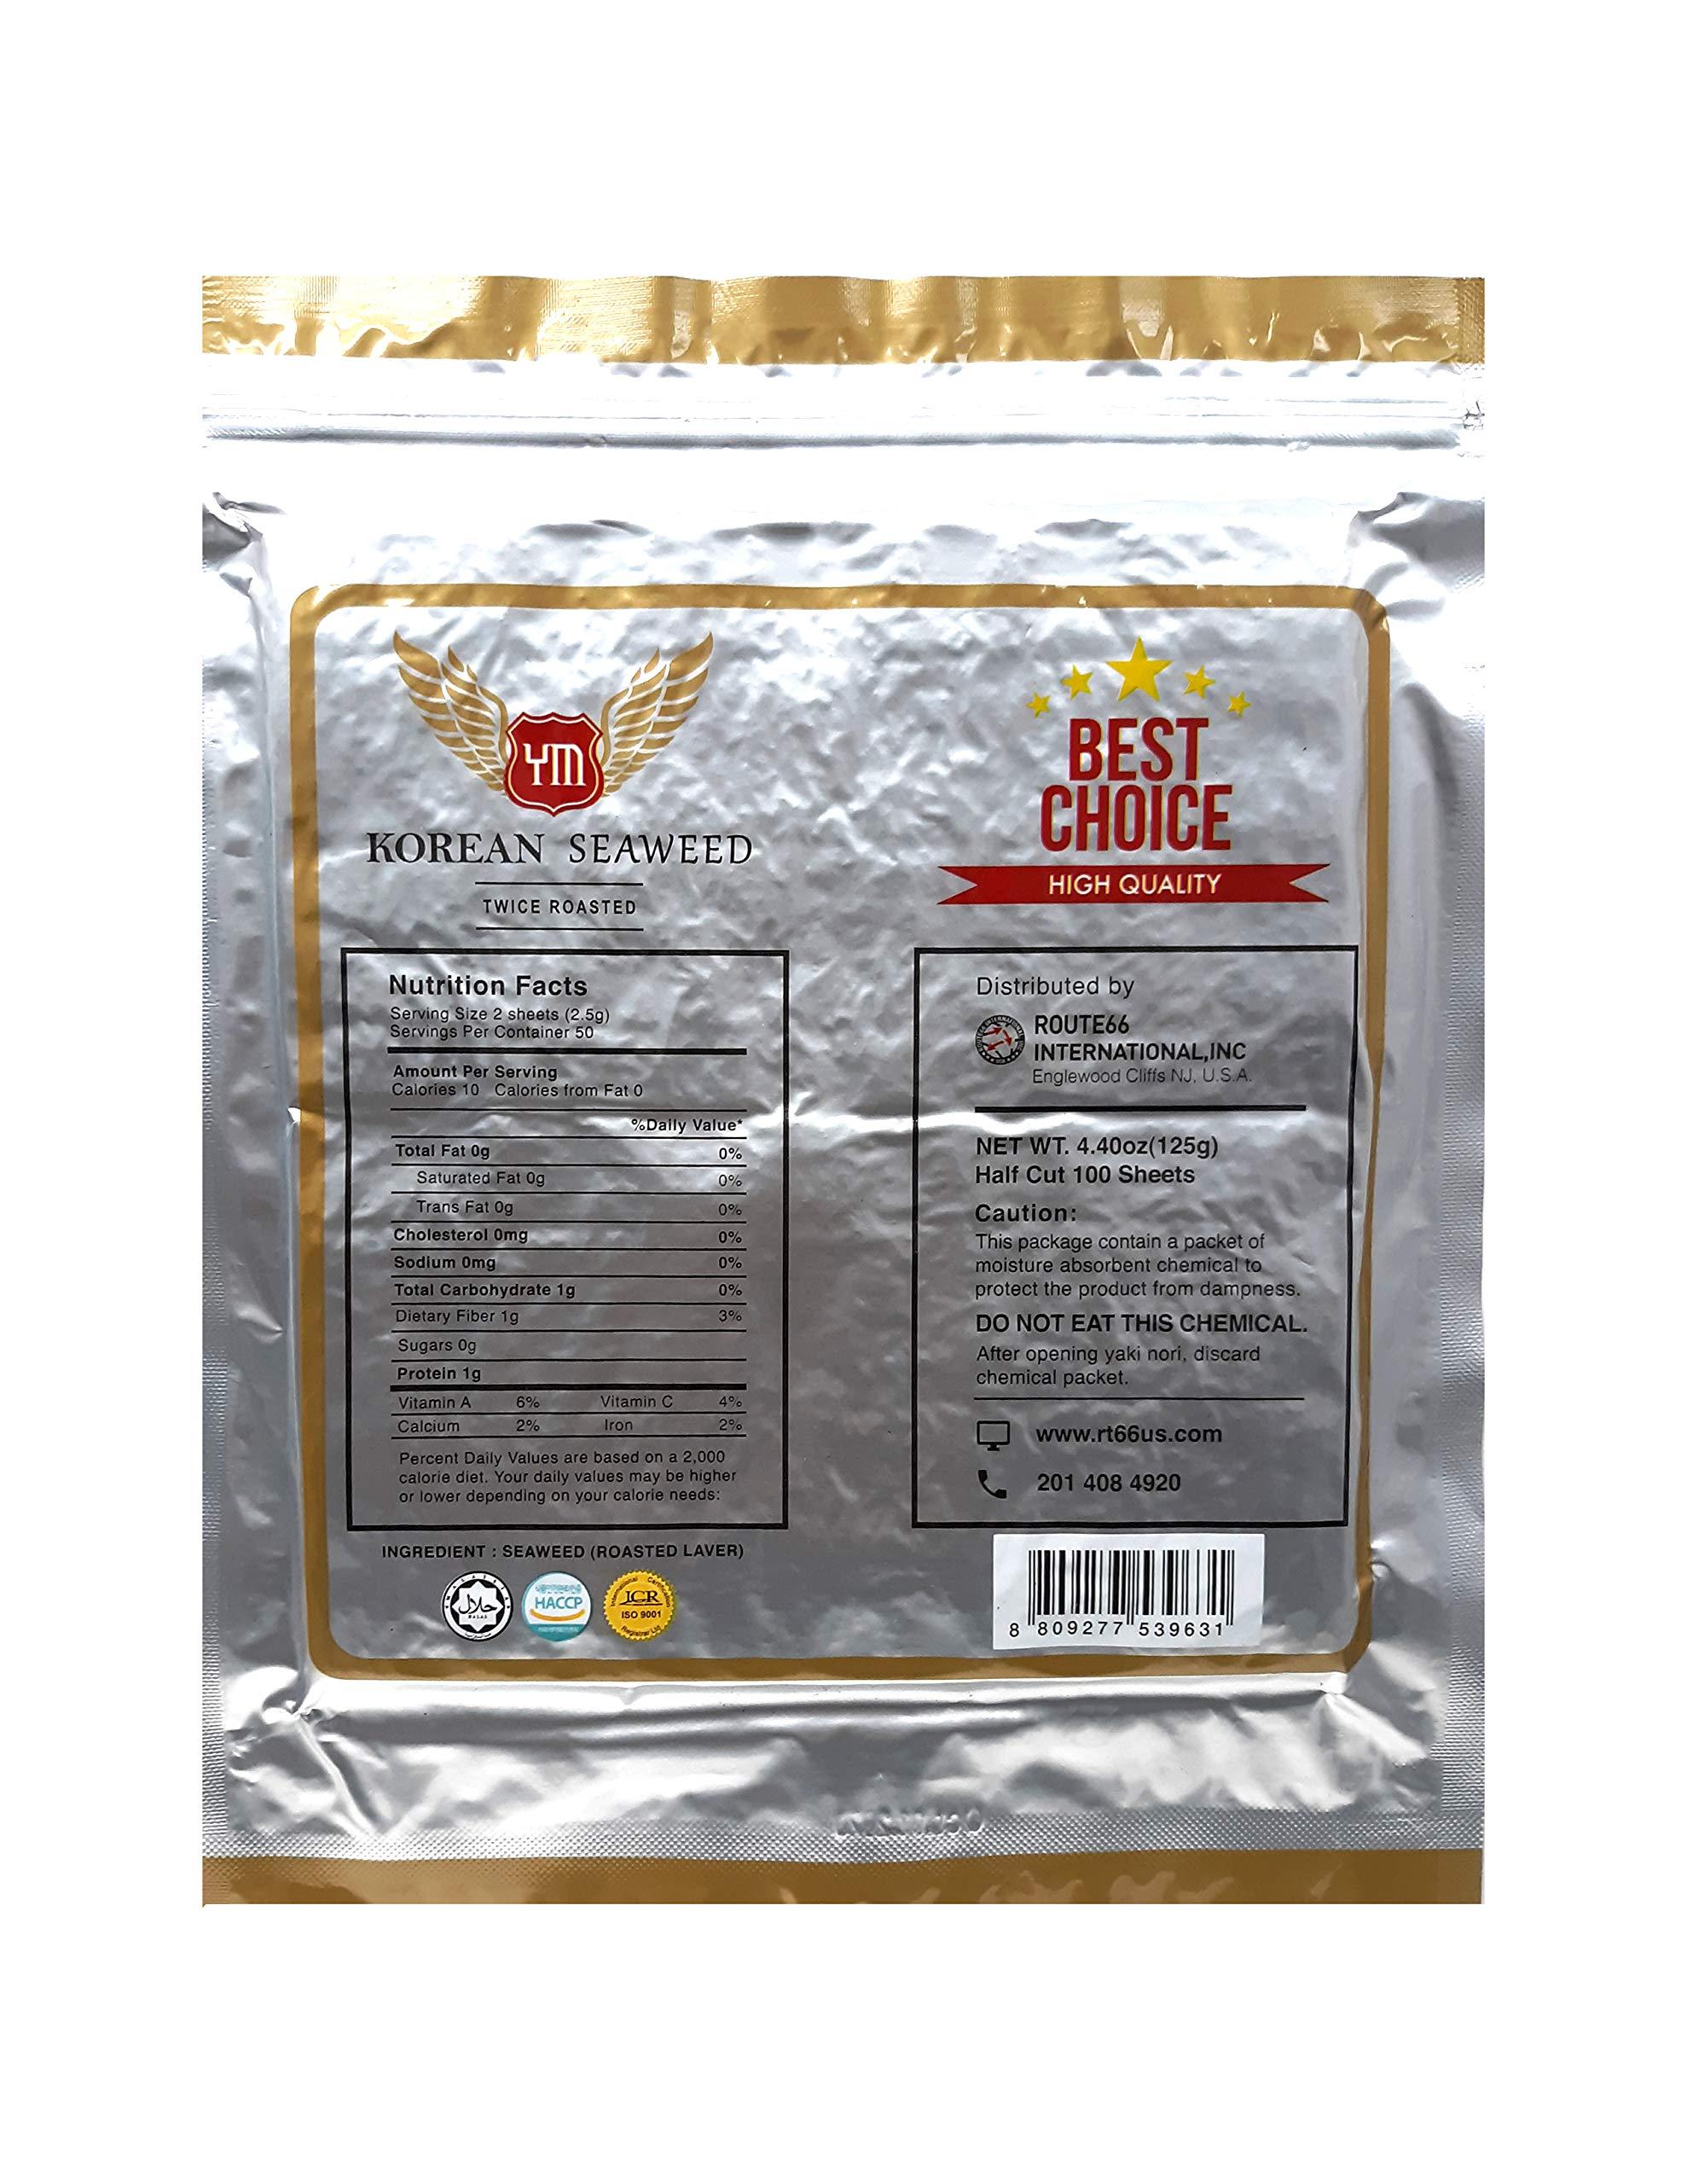 YM Korean Roasted Seaweed Premium Sushi Nori   Premium Gold Grade   Twice Roasted   100% Natural Korean Seaweed   100 Half Sheets (1 Pack) by YM (Image #2)